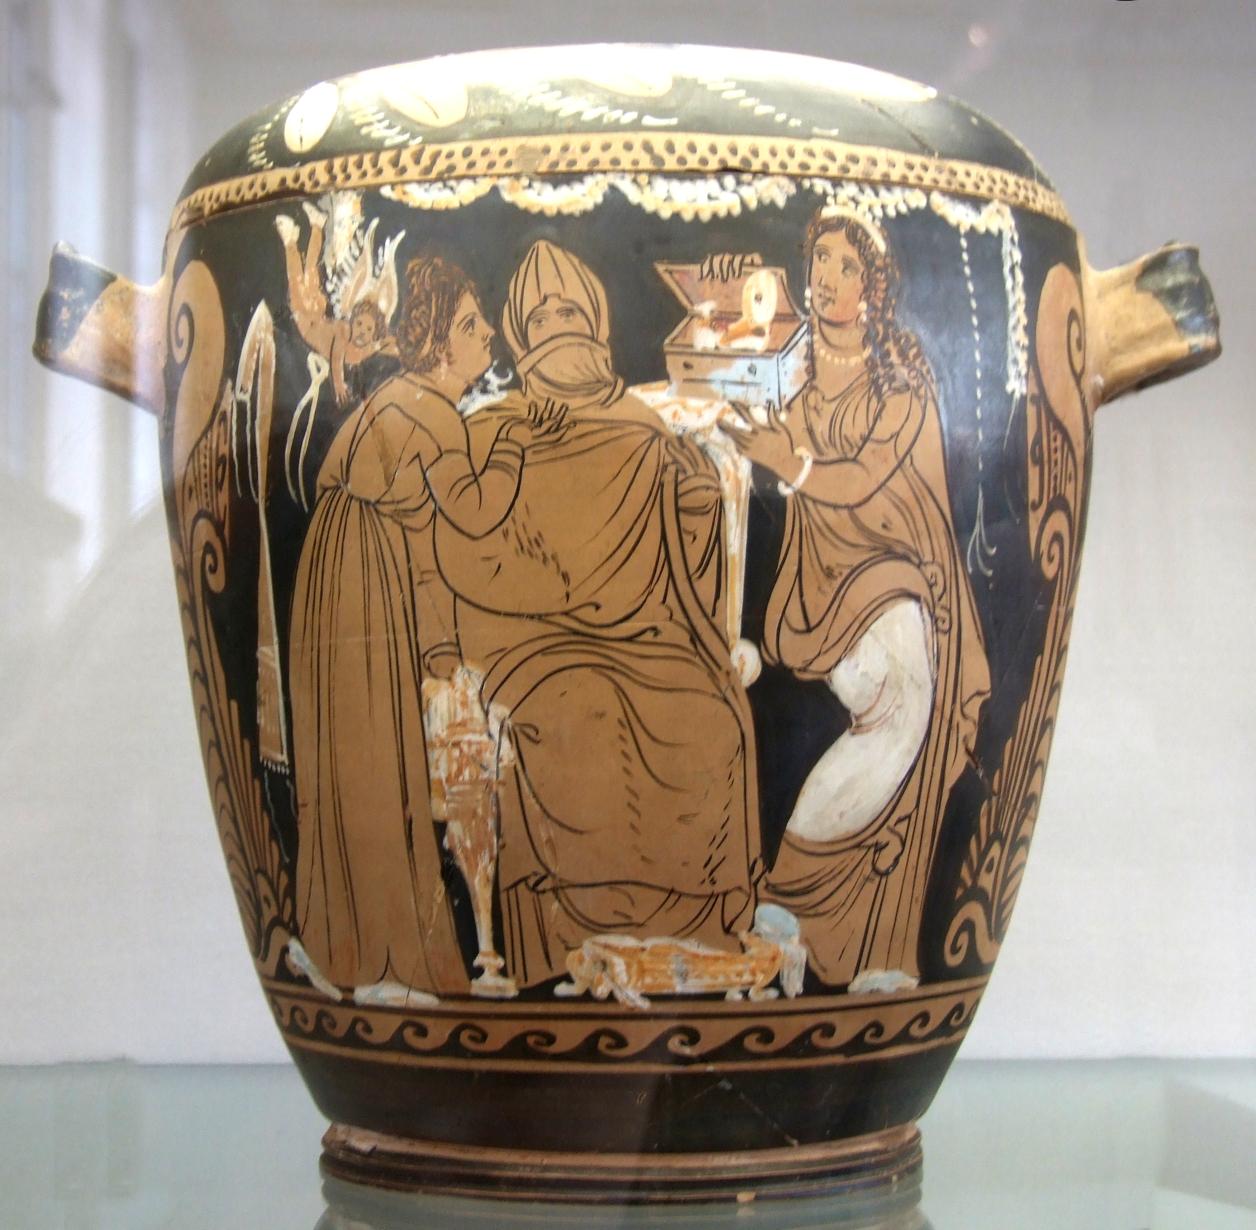 Babes in Artemisa